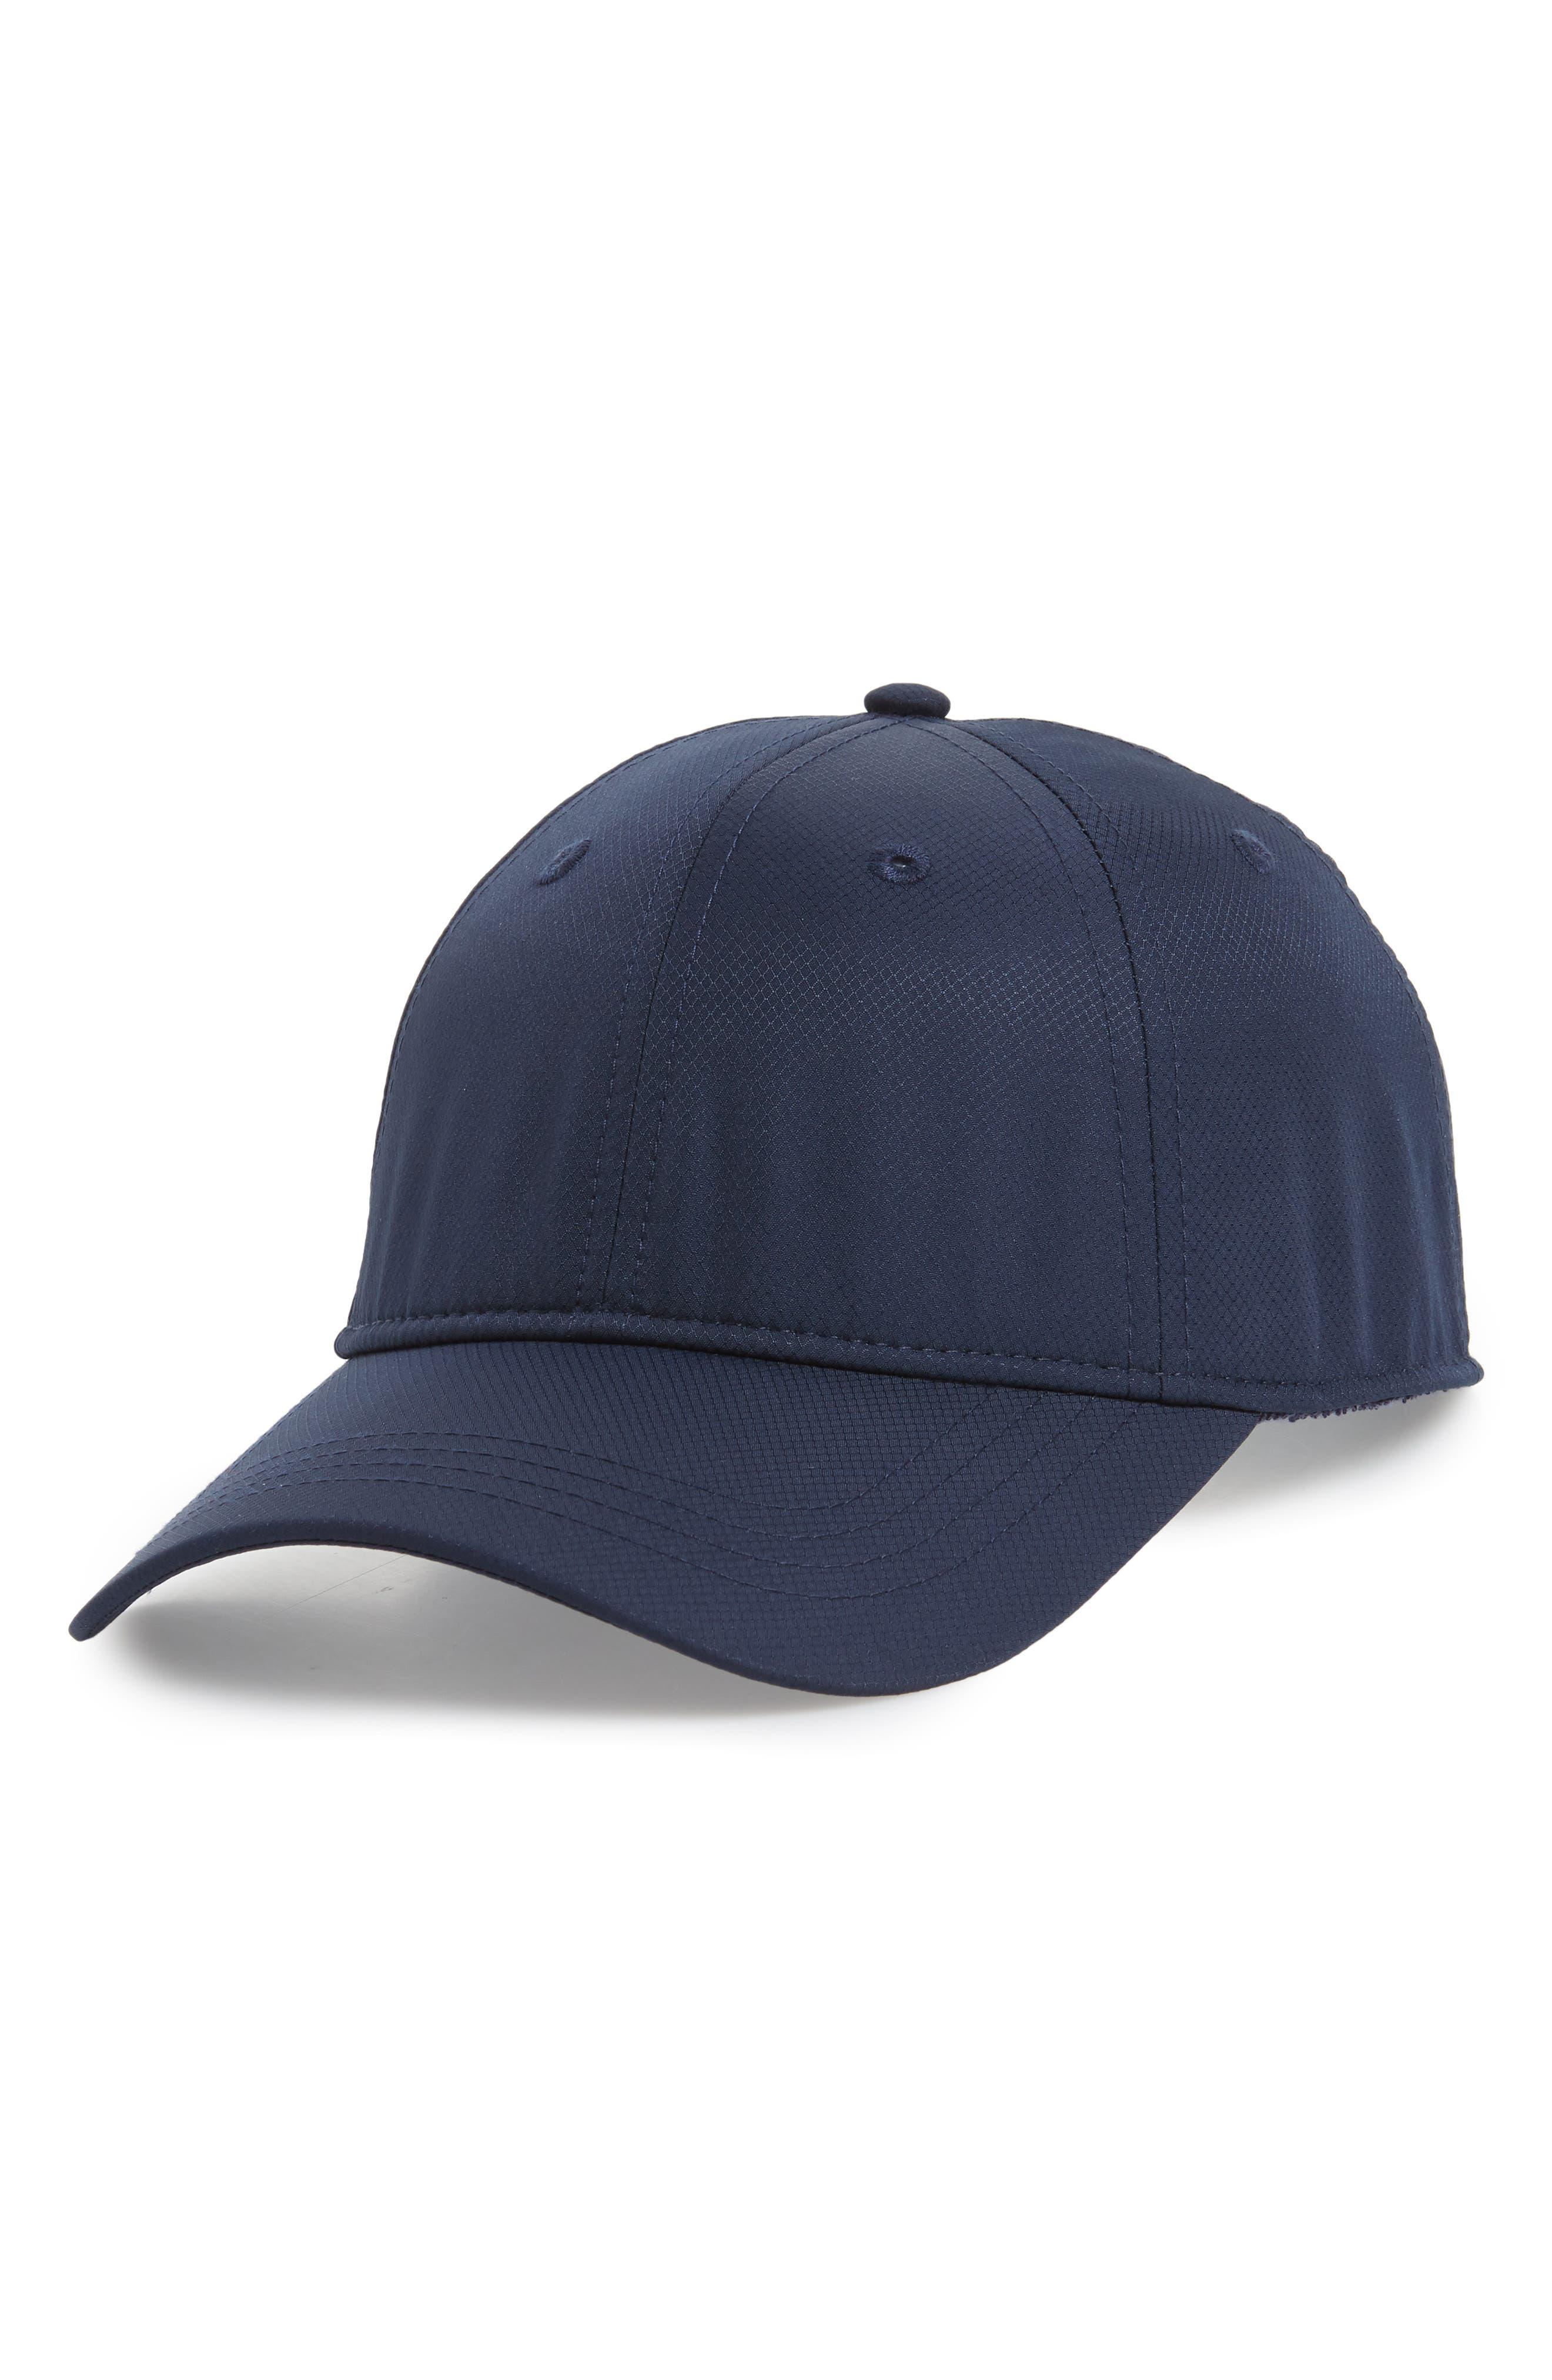 Sport Baseball Cap,                             Main thumbnail 1, color,                             Navy Blue